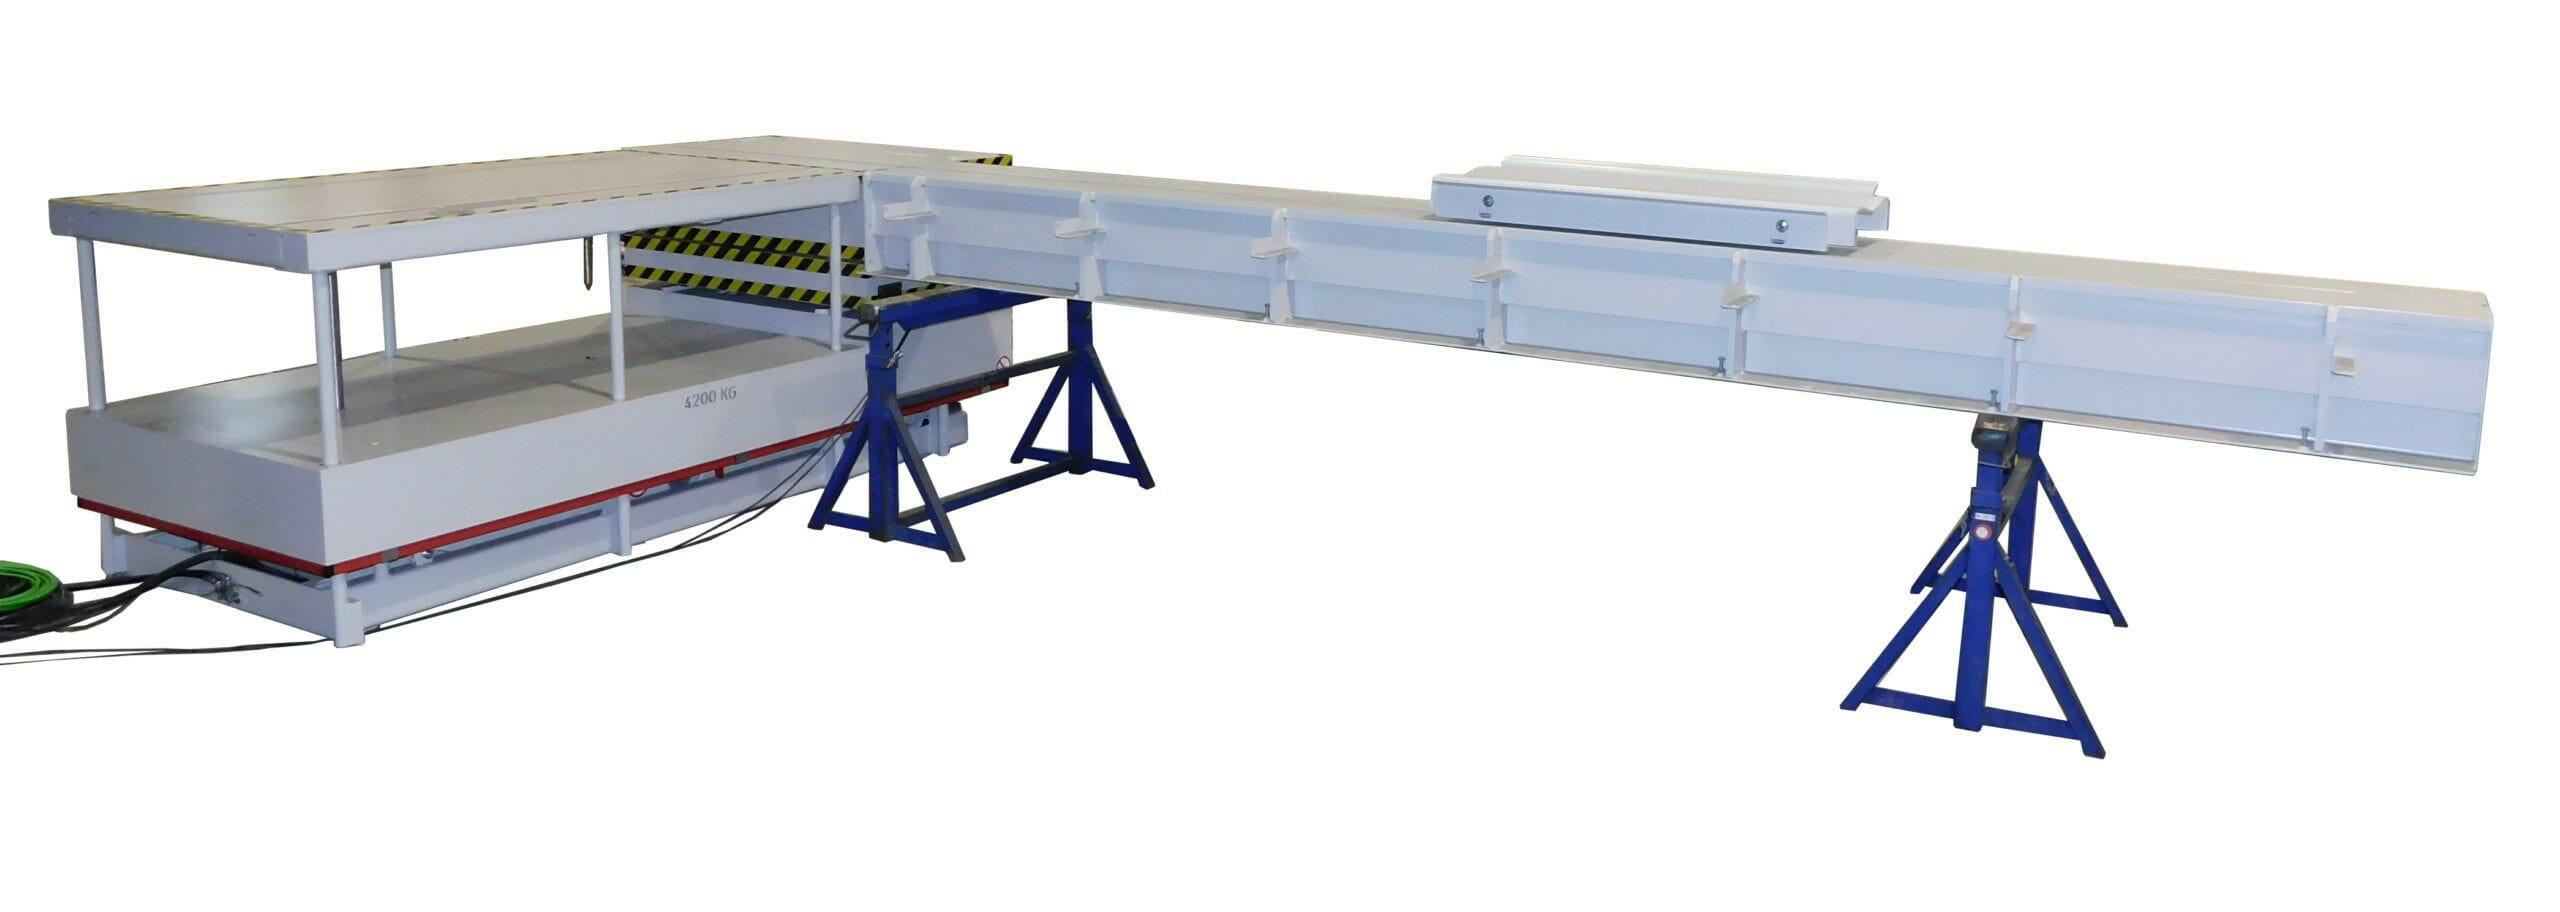 Abbildung Papier und Kunststoff Coiltransporter lang